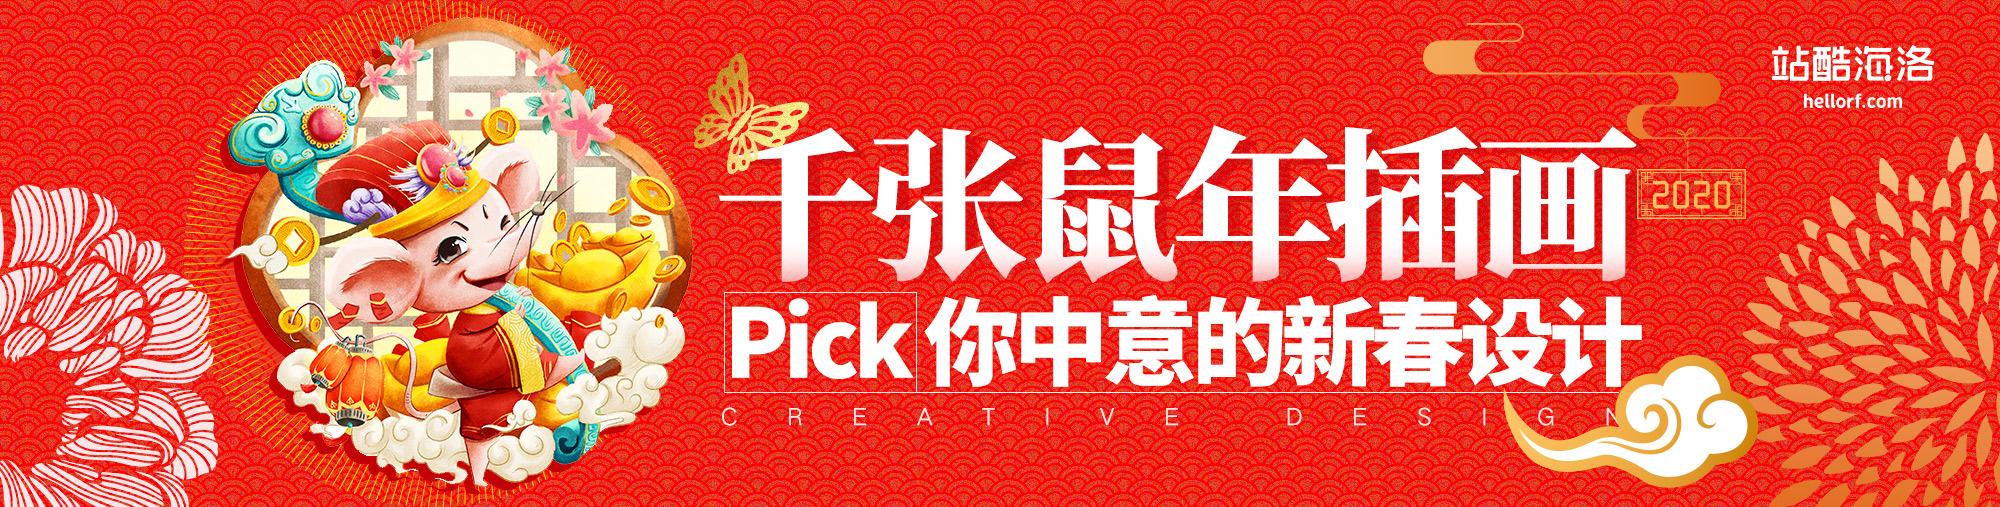 2000-507-pick-.jpg